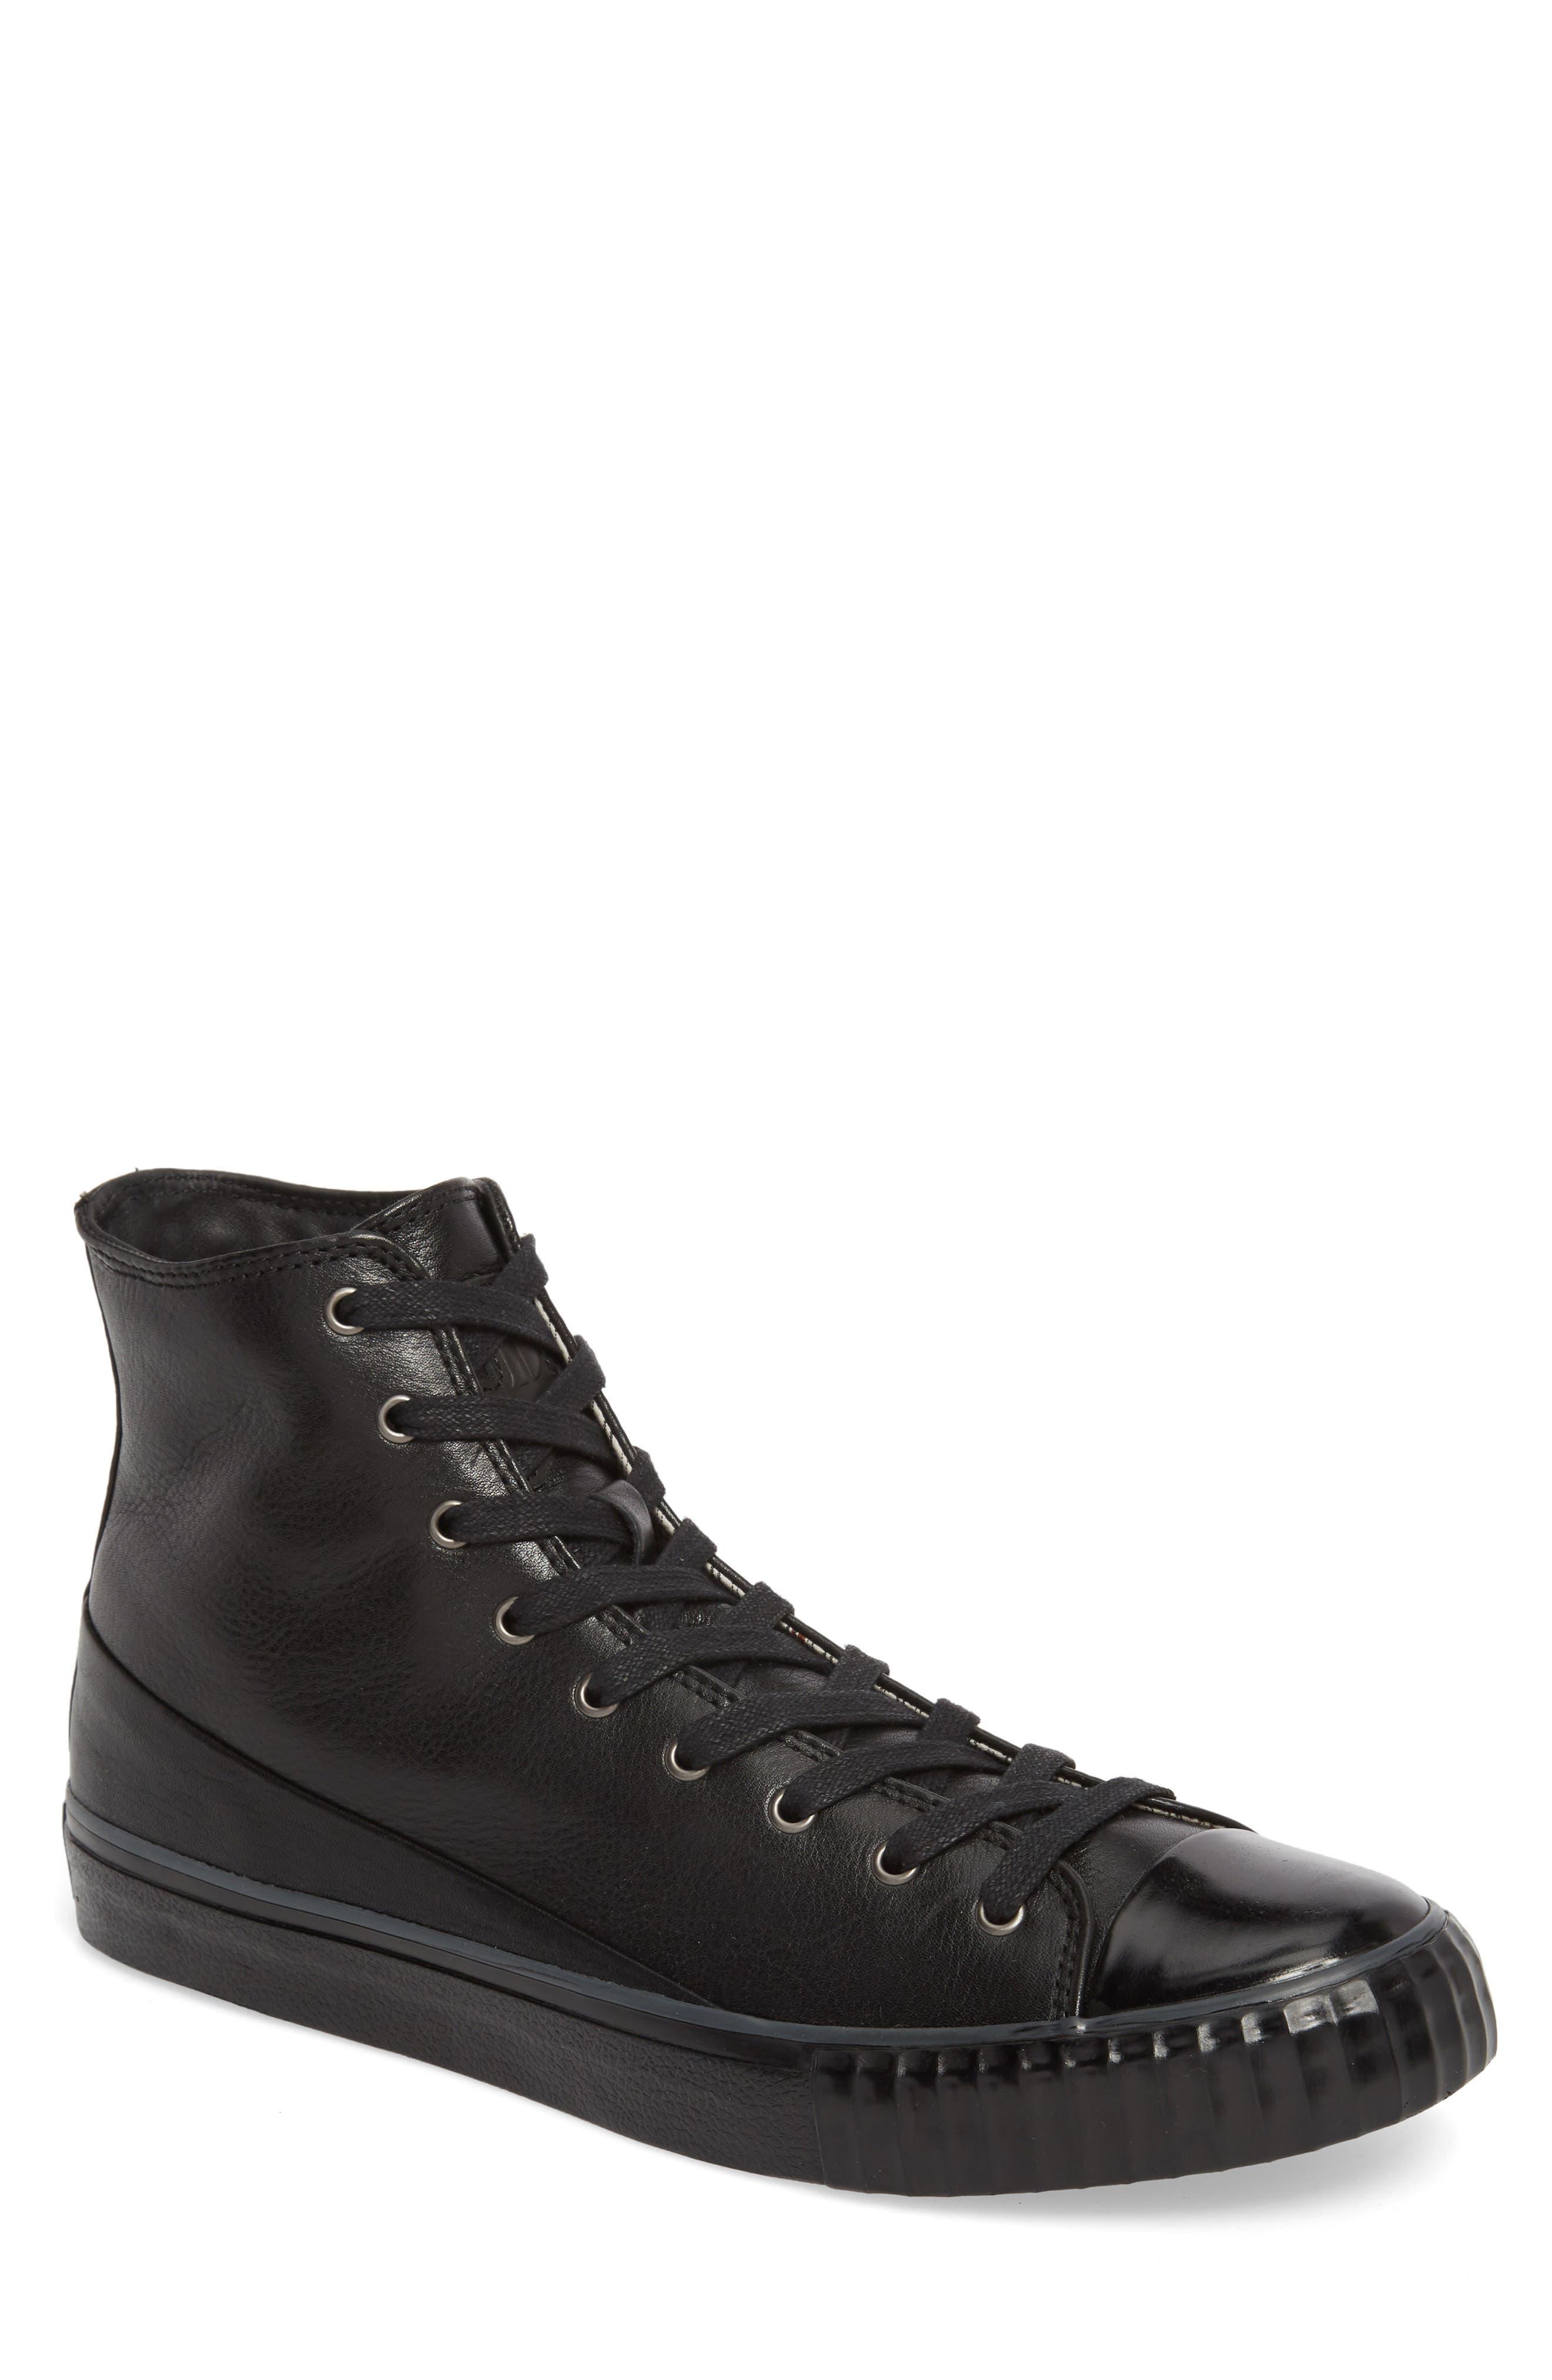 Bootleg High Top Sneaker,                             Main thumbnail 1, color,                             BLACK LEATHER